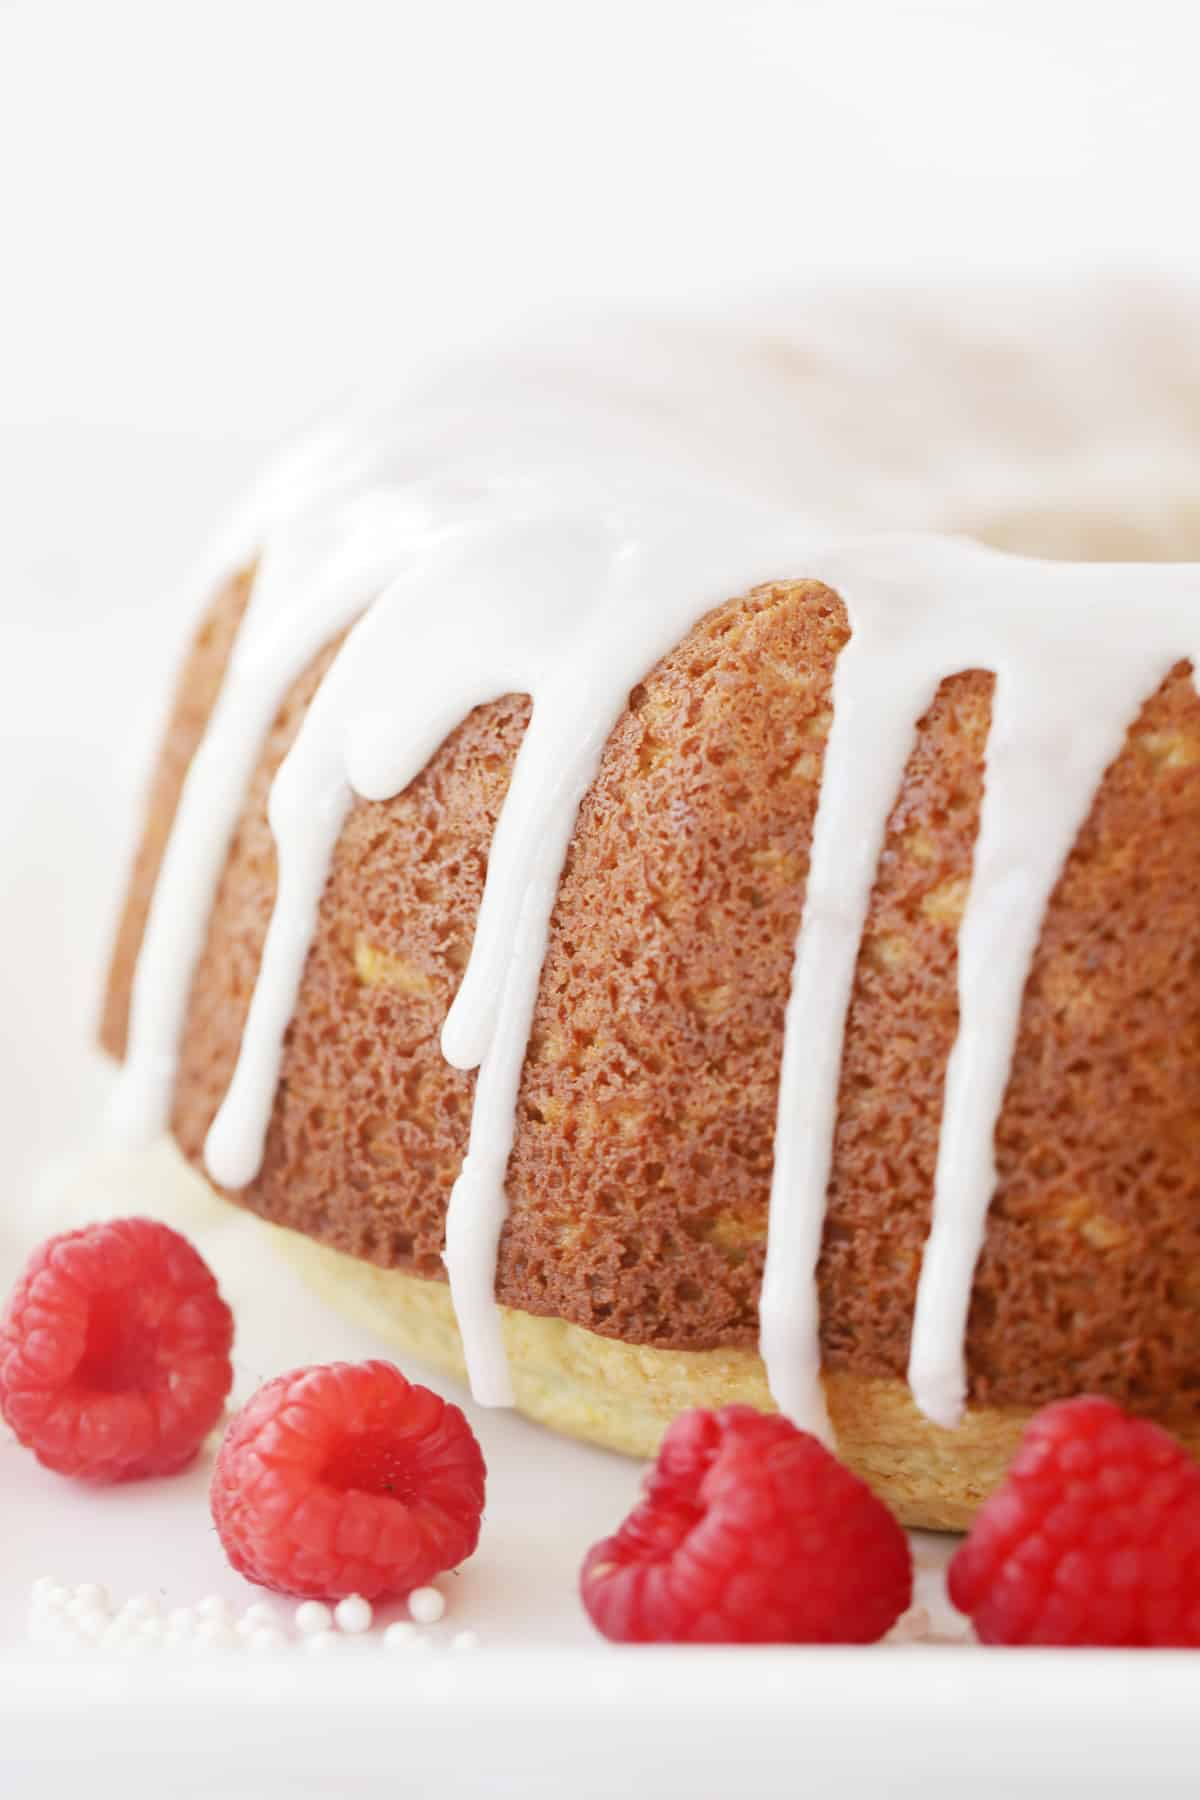 A glazed bundt cake garnished with fresh raspberries.